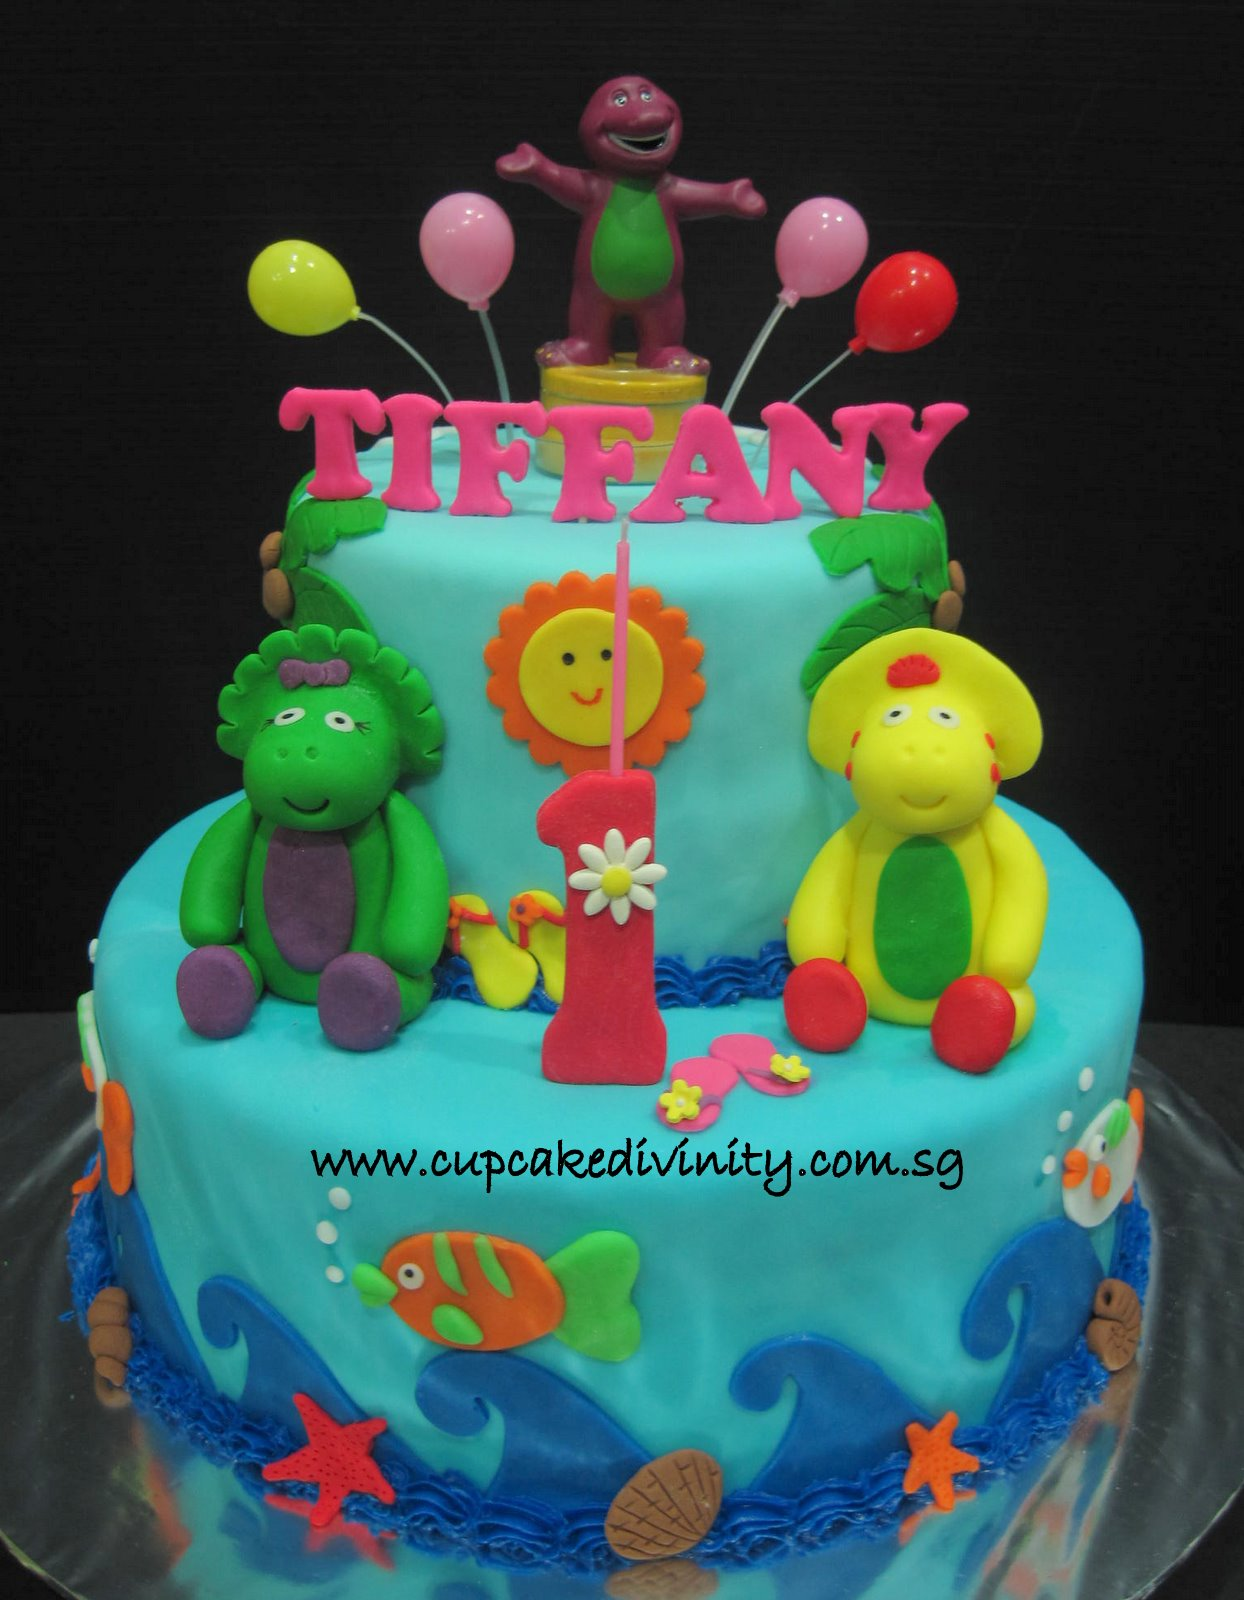 barney cake - photo #20